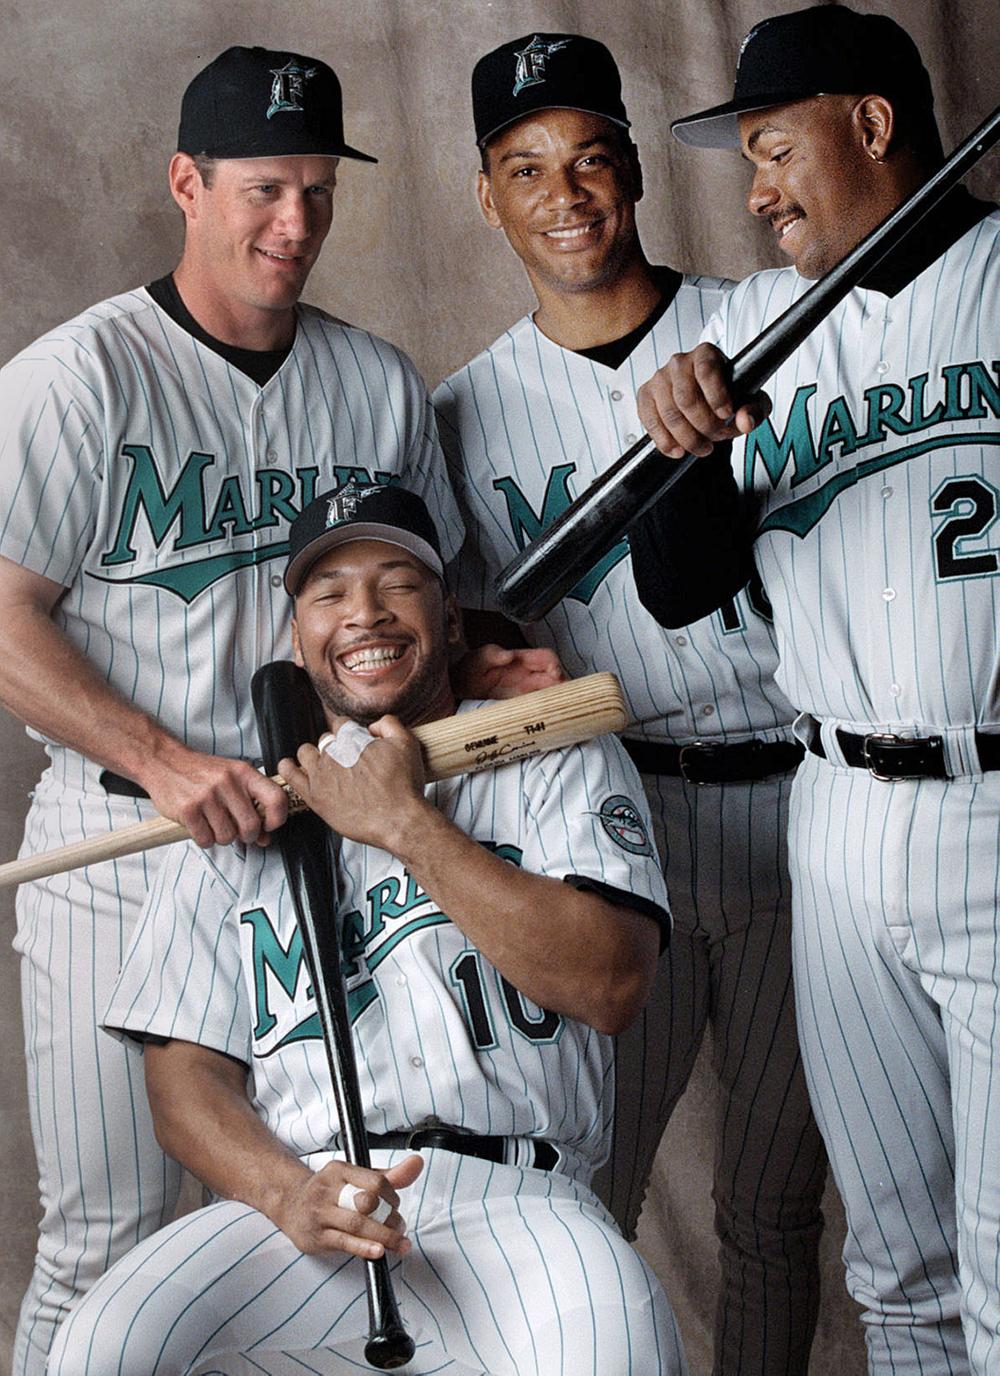 '97 Florida Marlins sluggers.